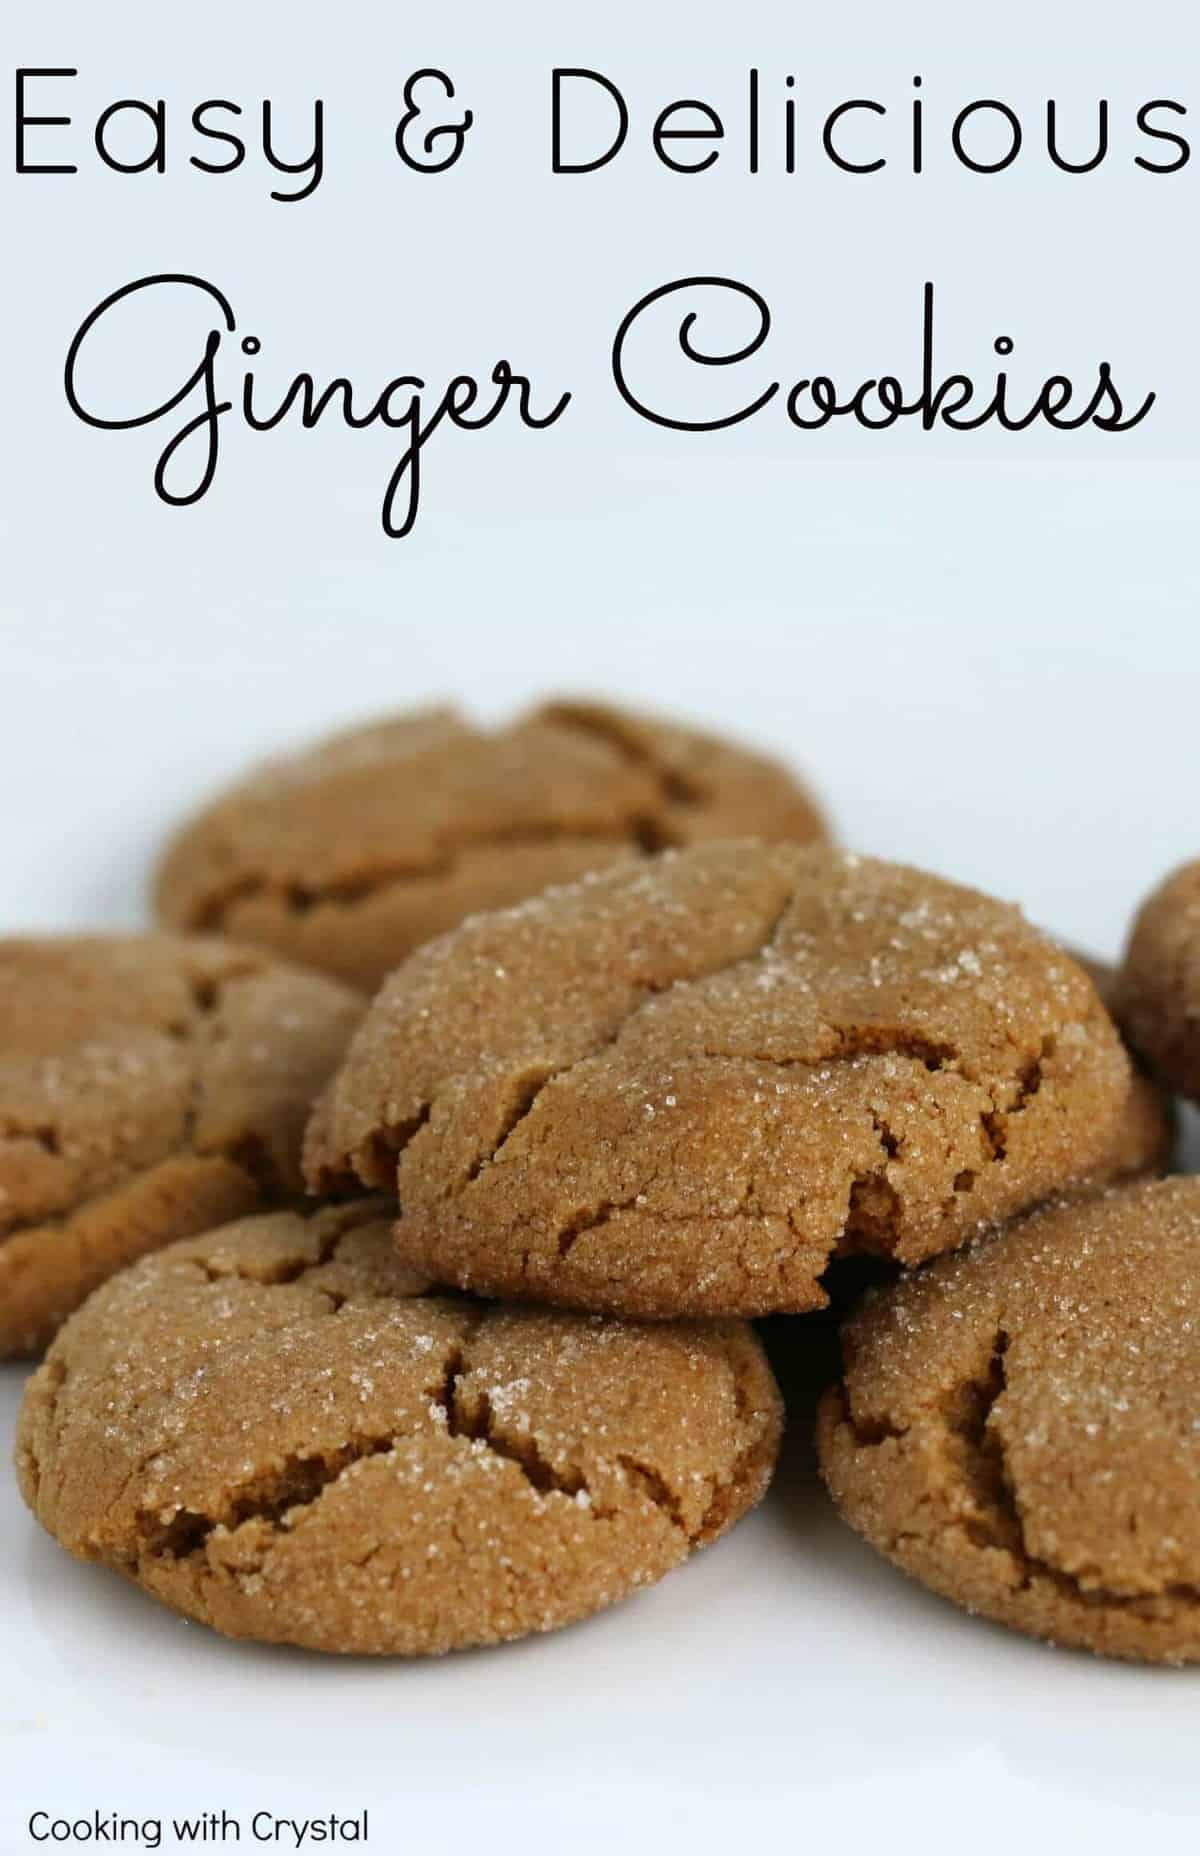 Lime 'Swig' Style Sugar Cookies - Princess Pinky Girl